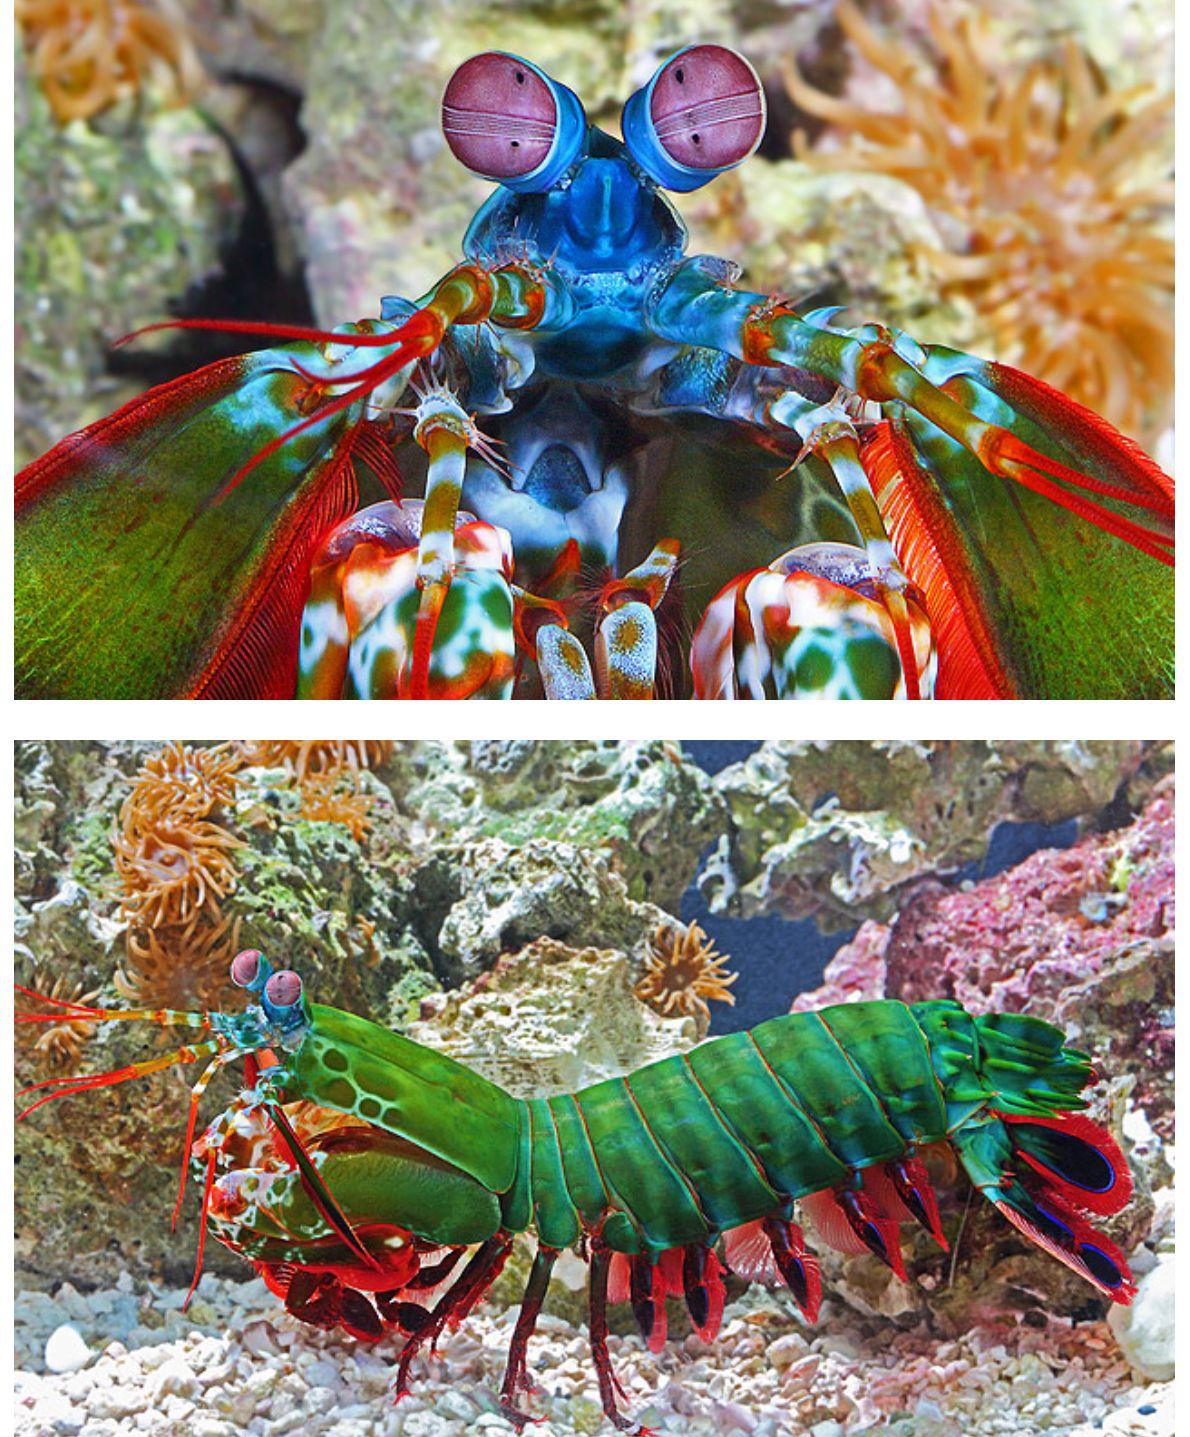 Peacock Mantis Shrimp Beautiful Sea Creatures Mantis Shrimp My Spirit Animal